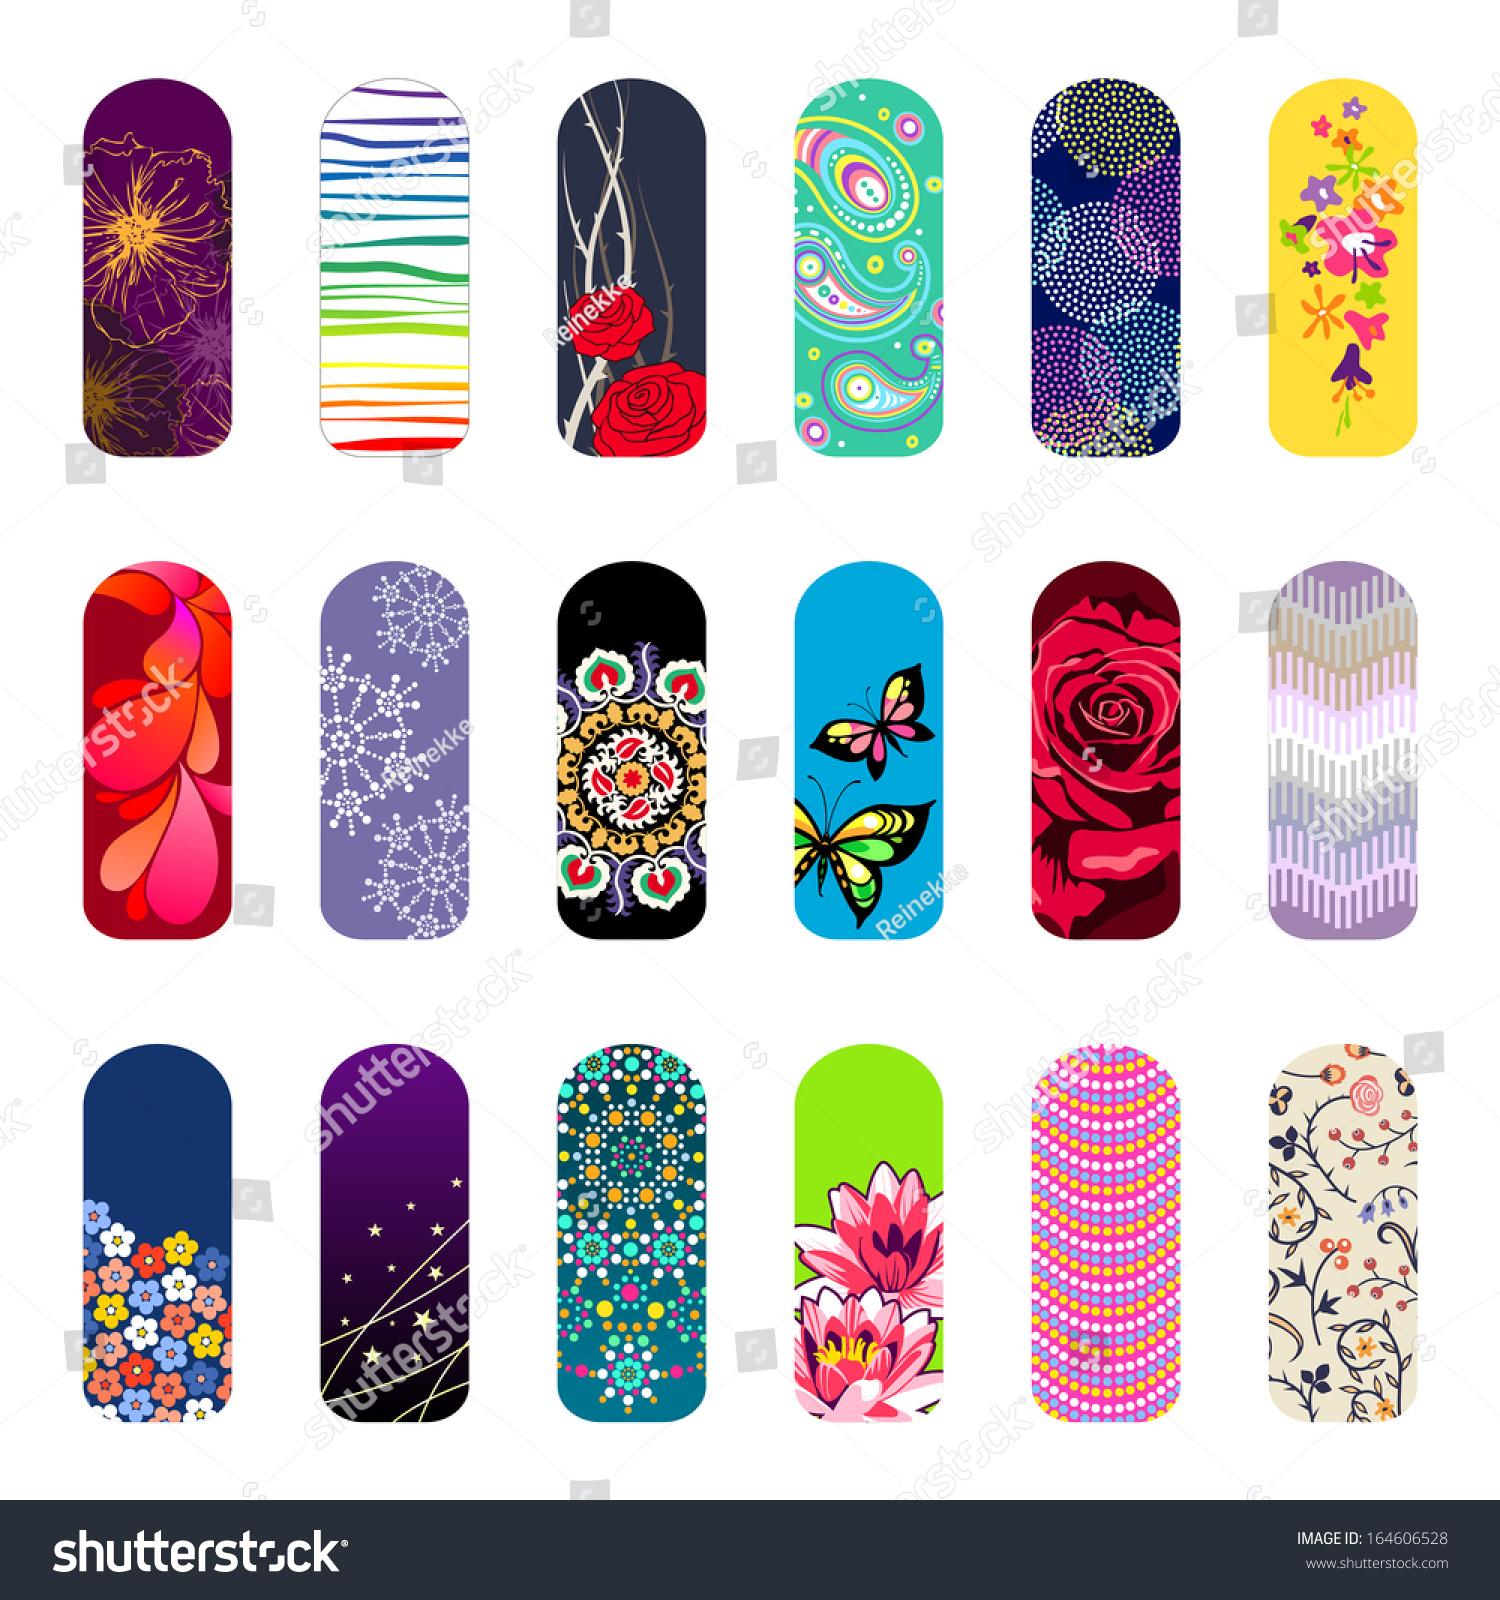 Nail Art Vector: Set Of Nail Art Designs For Beauty Salon Stock Vector